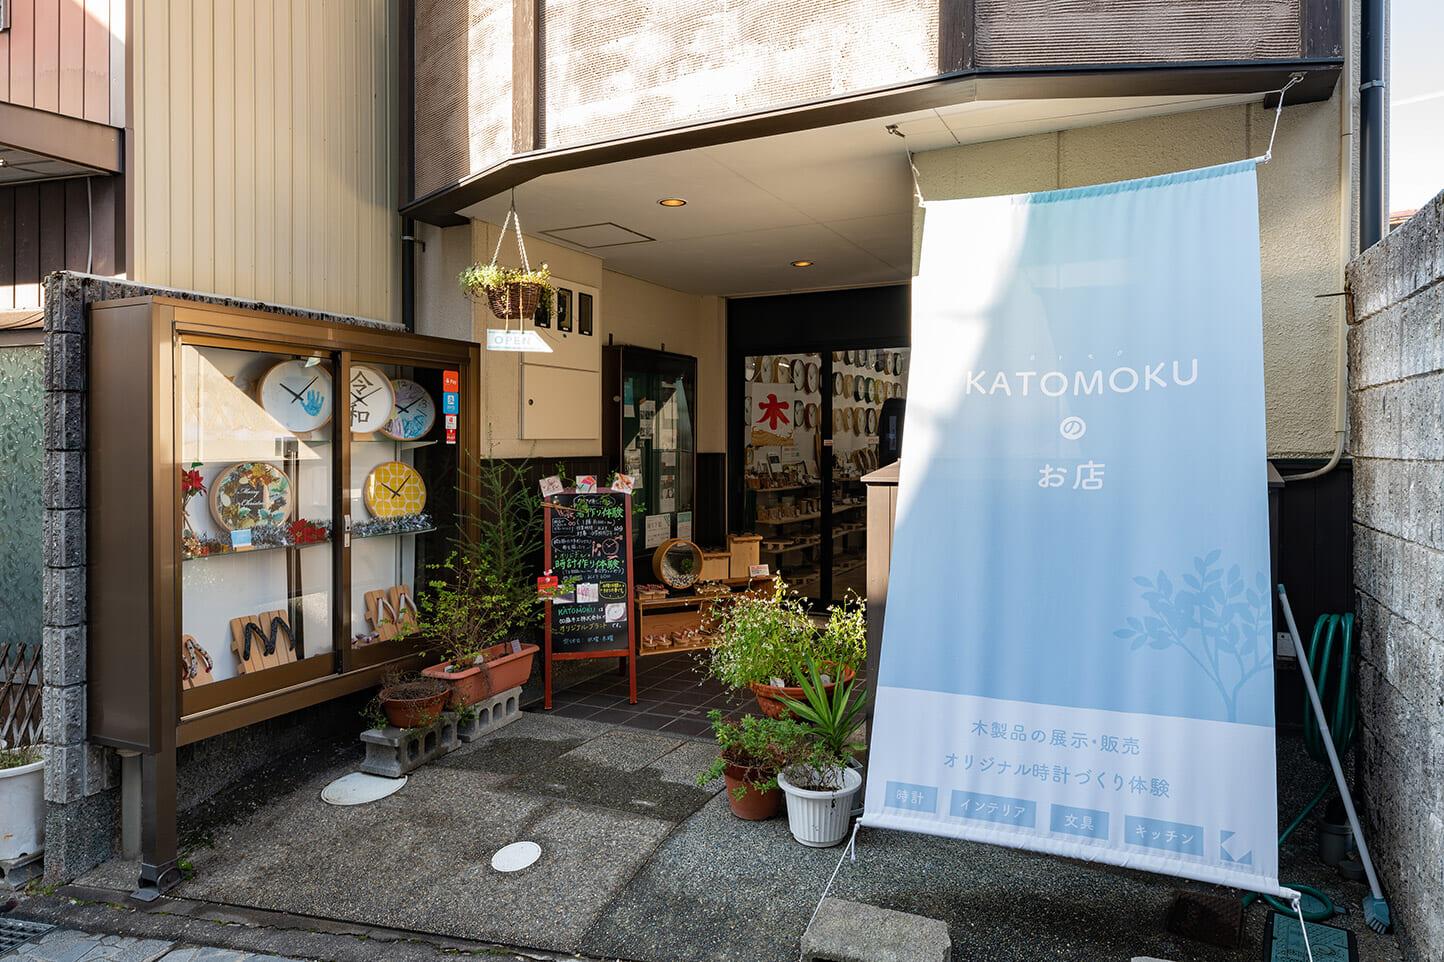 KATOMOKUのお店 スライダー画像2